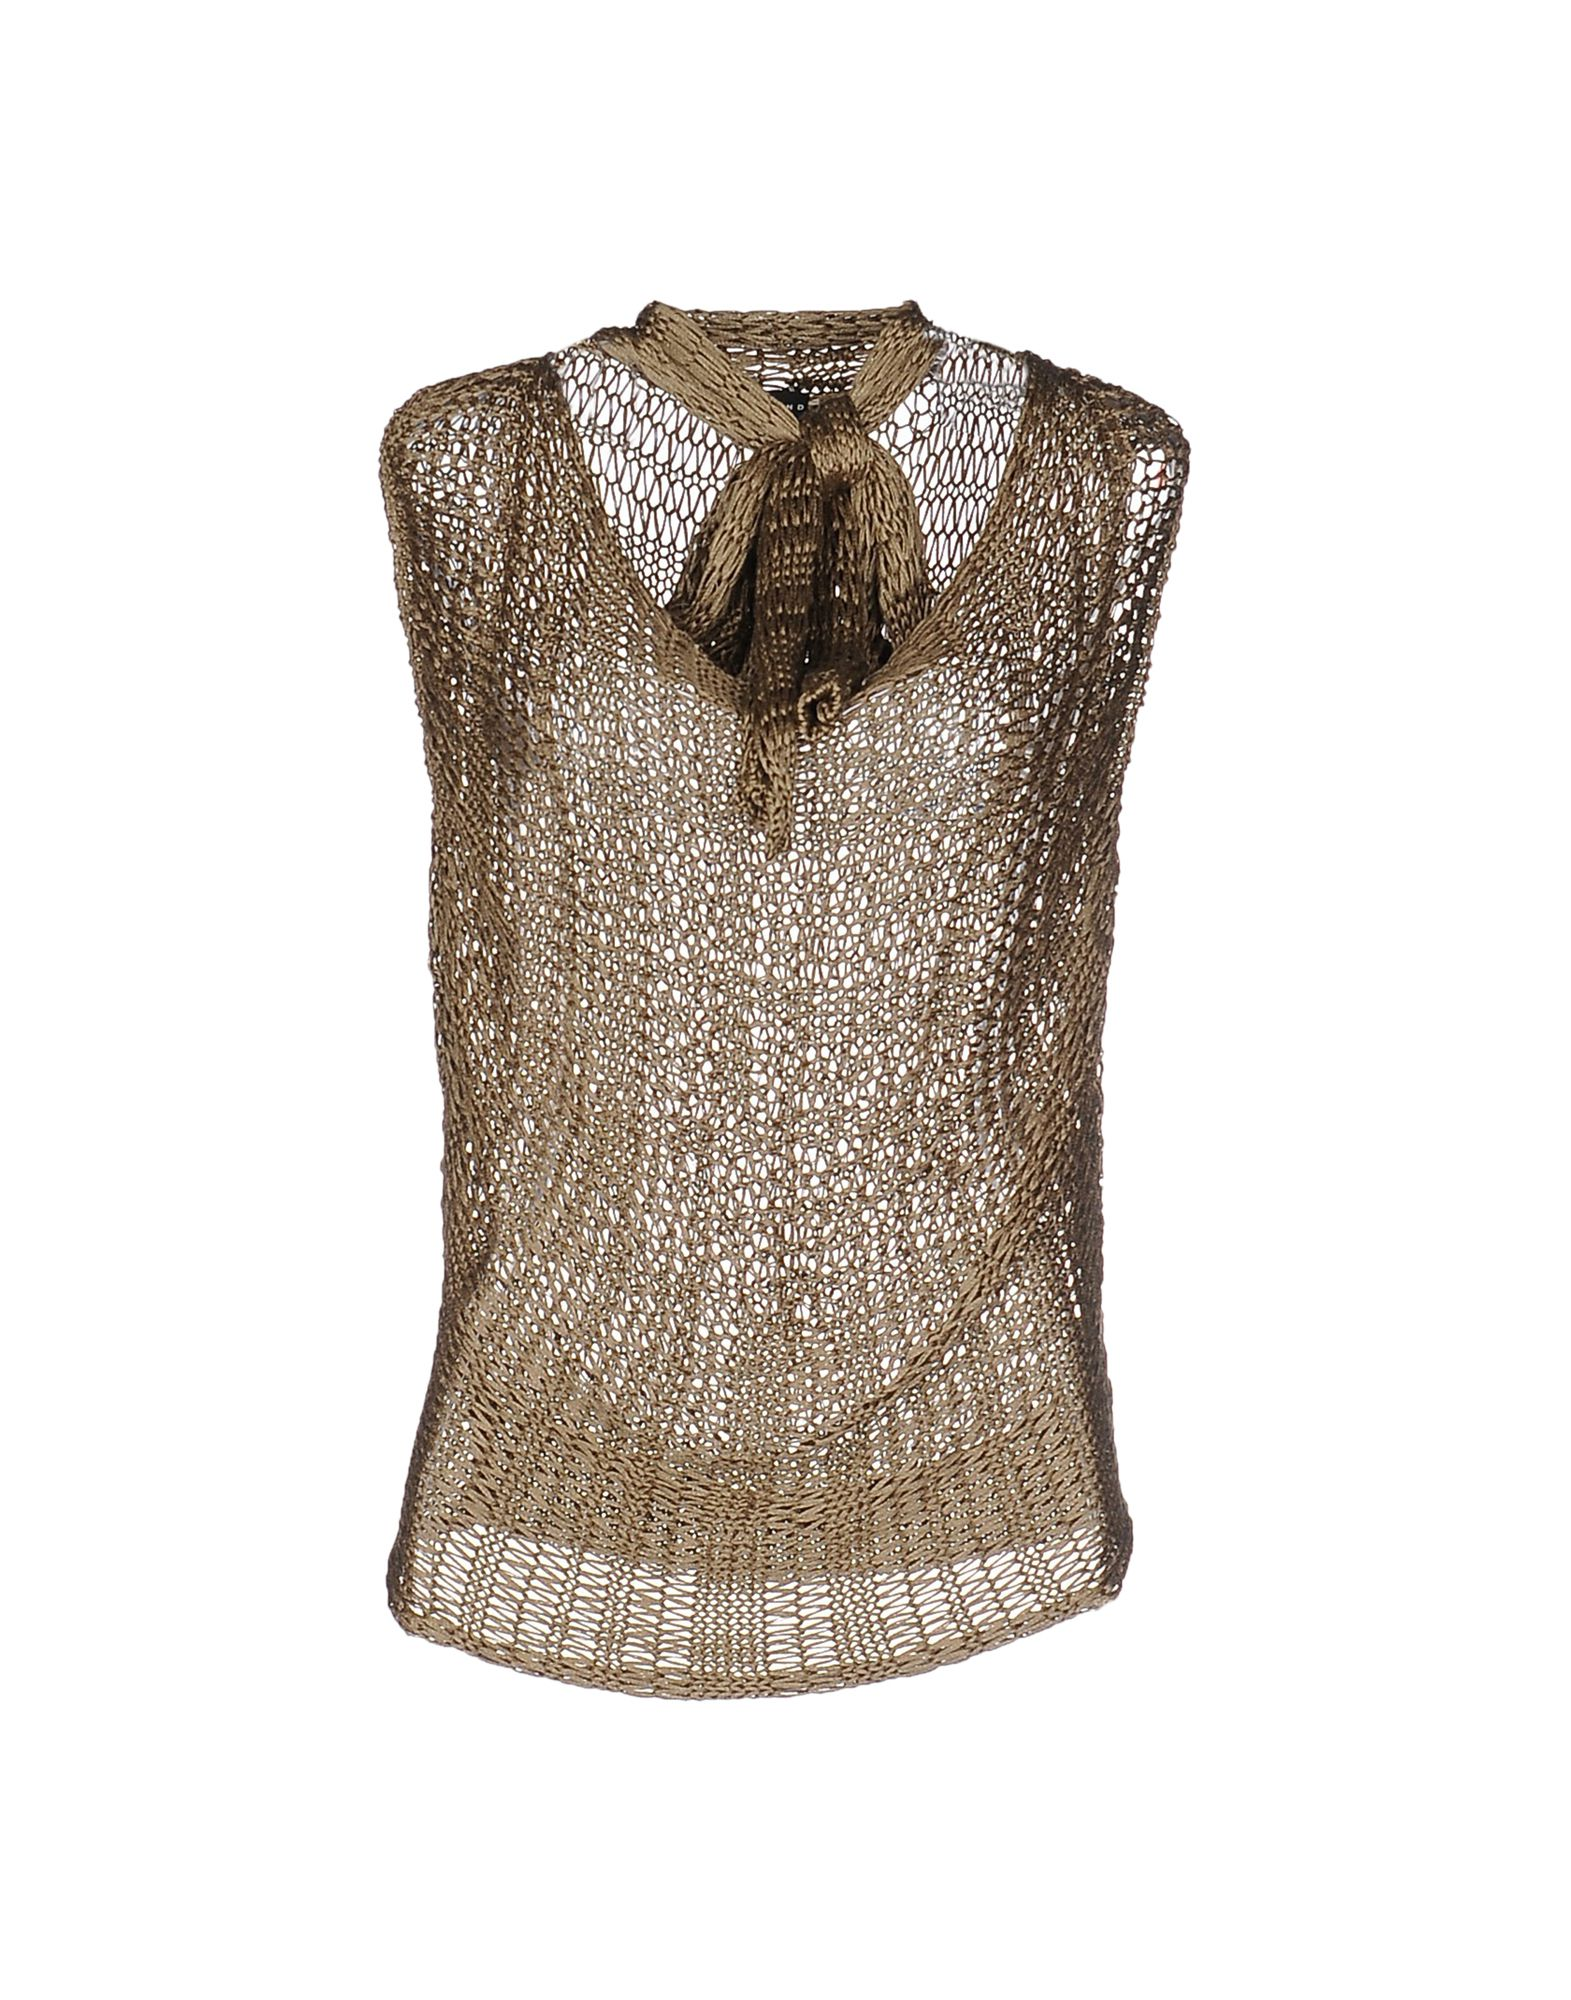 RICHMOND DENIM Sweater in Khaki